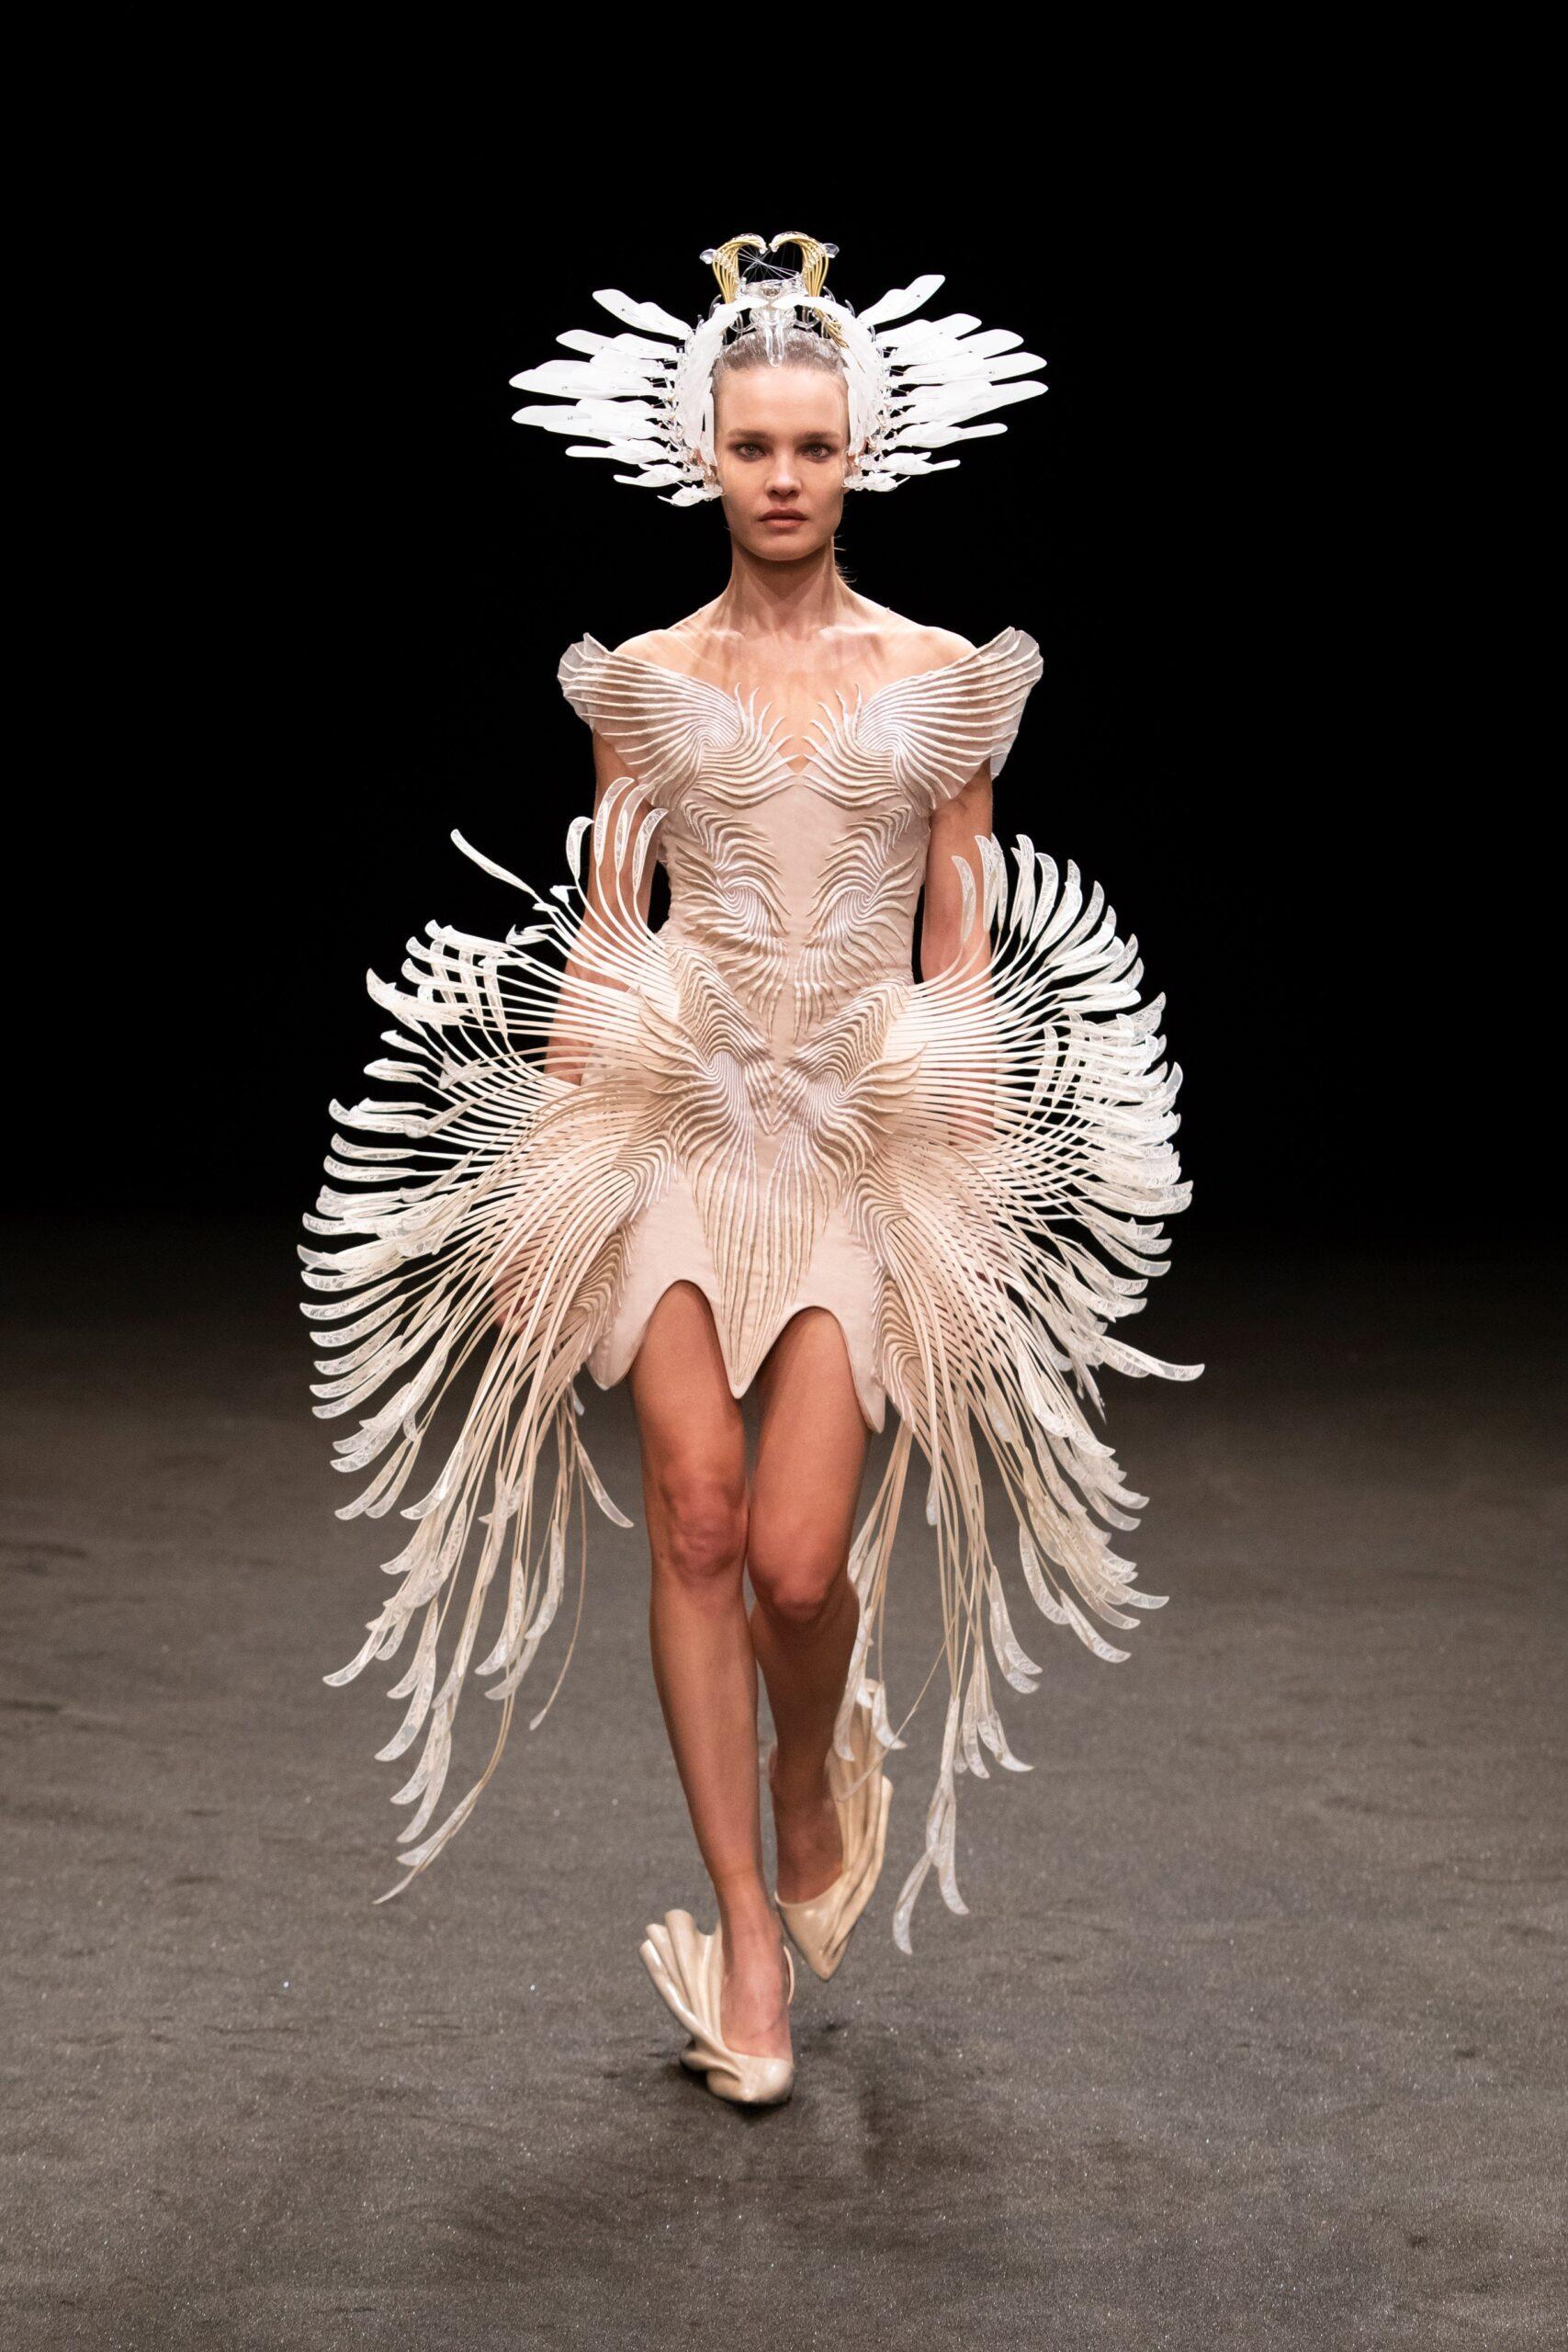 00021 Iris van Herpen Couture Spring 21 credit Gio Staiano